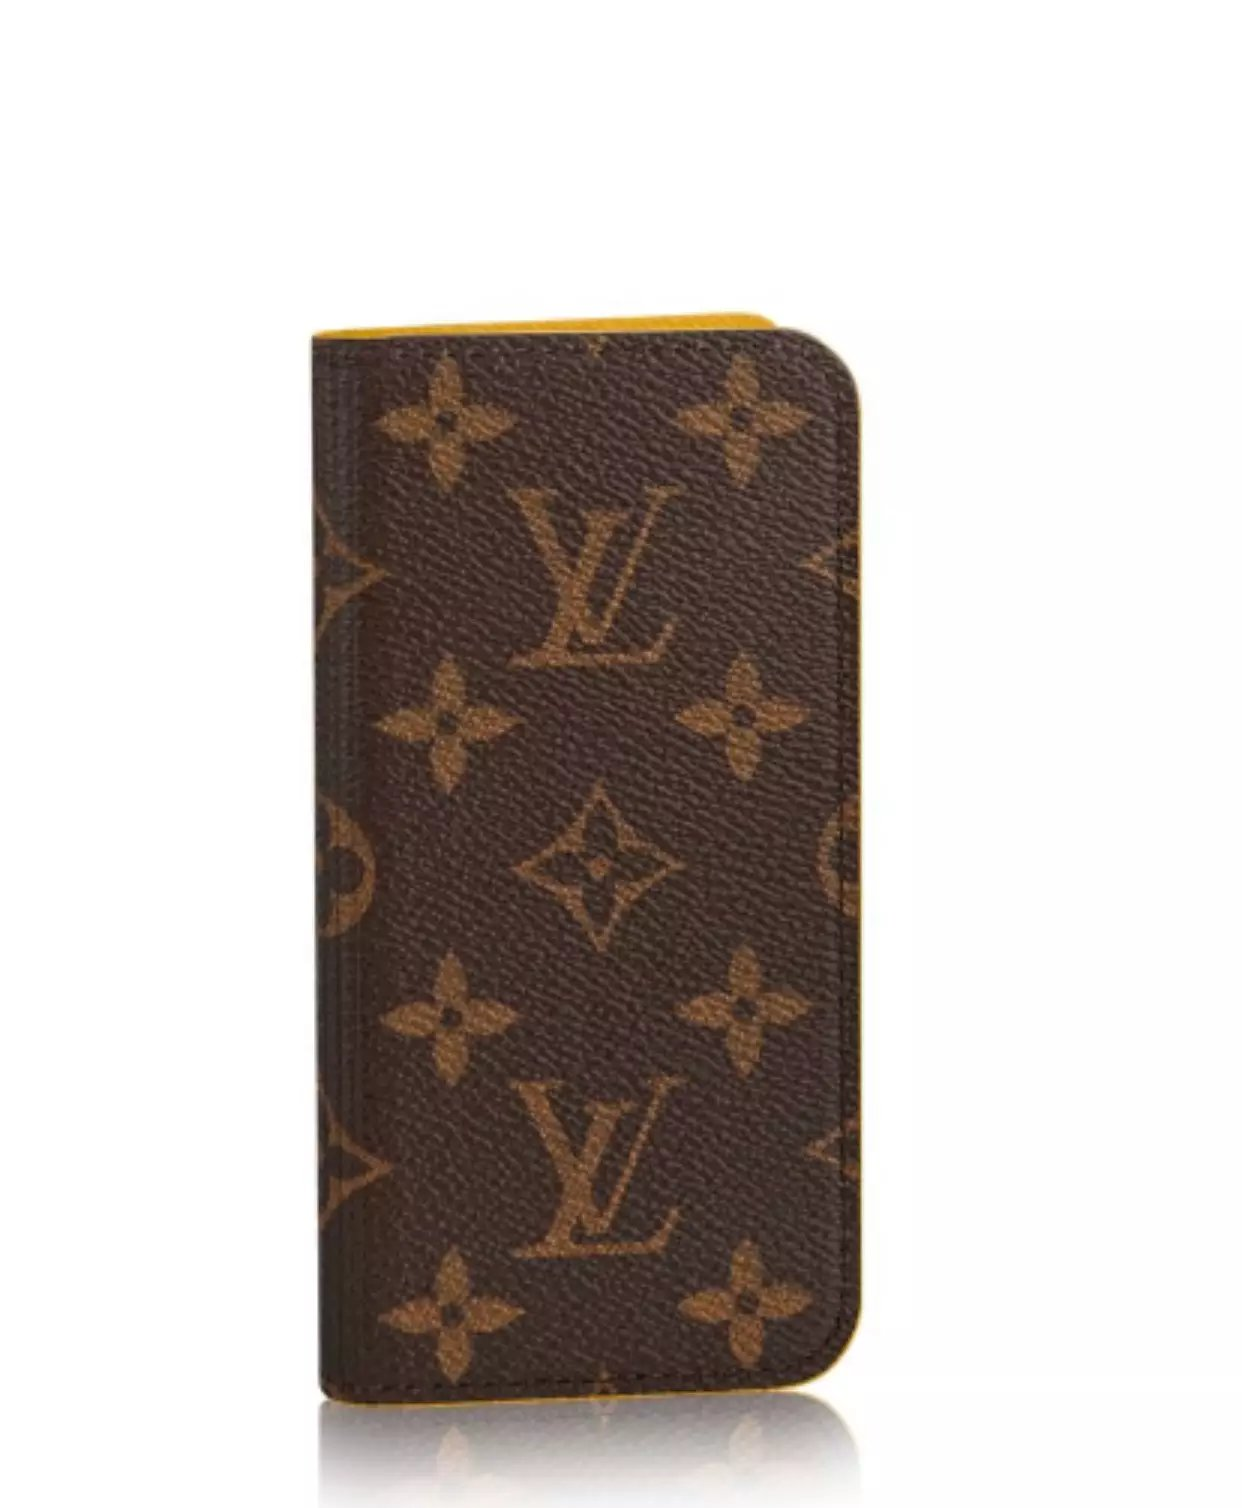 iphone schutzhülle iphone hülle selbst Louis Vuitton iphone6s hülle größe handyhülle galaxy s6s 1 phone 6s original apple zubehör eigene hülle erstellen hülle iphone